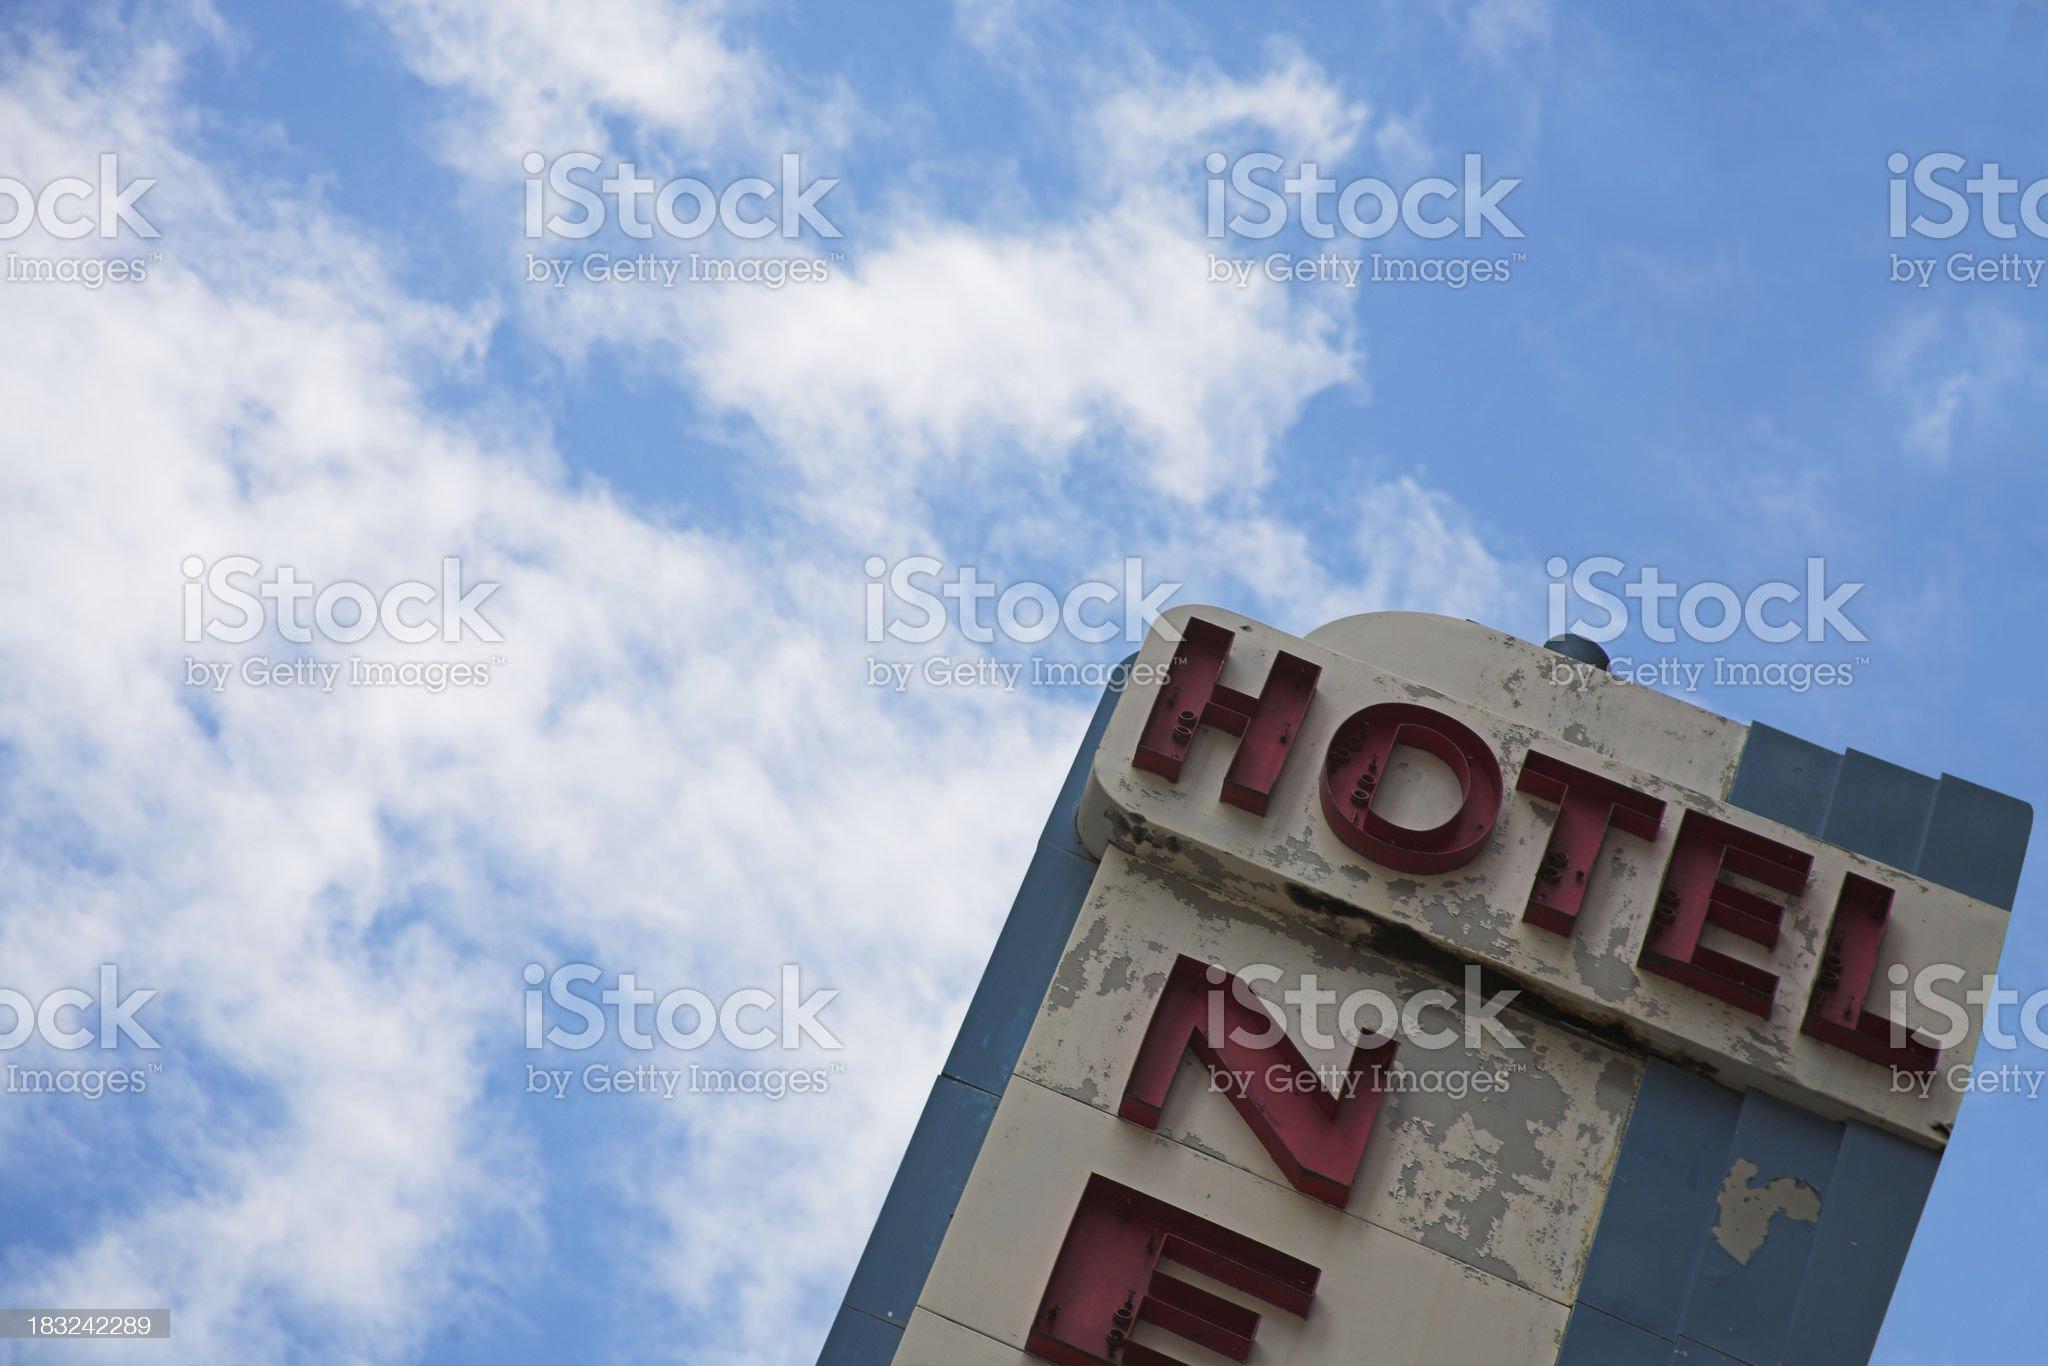 shabby hotel sign royalty-free stock photo